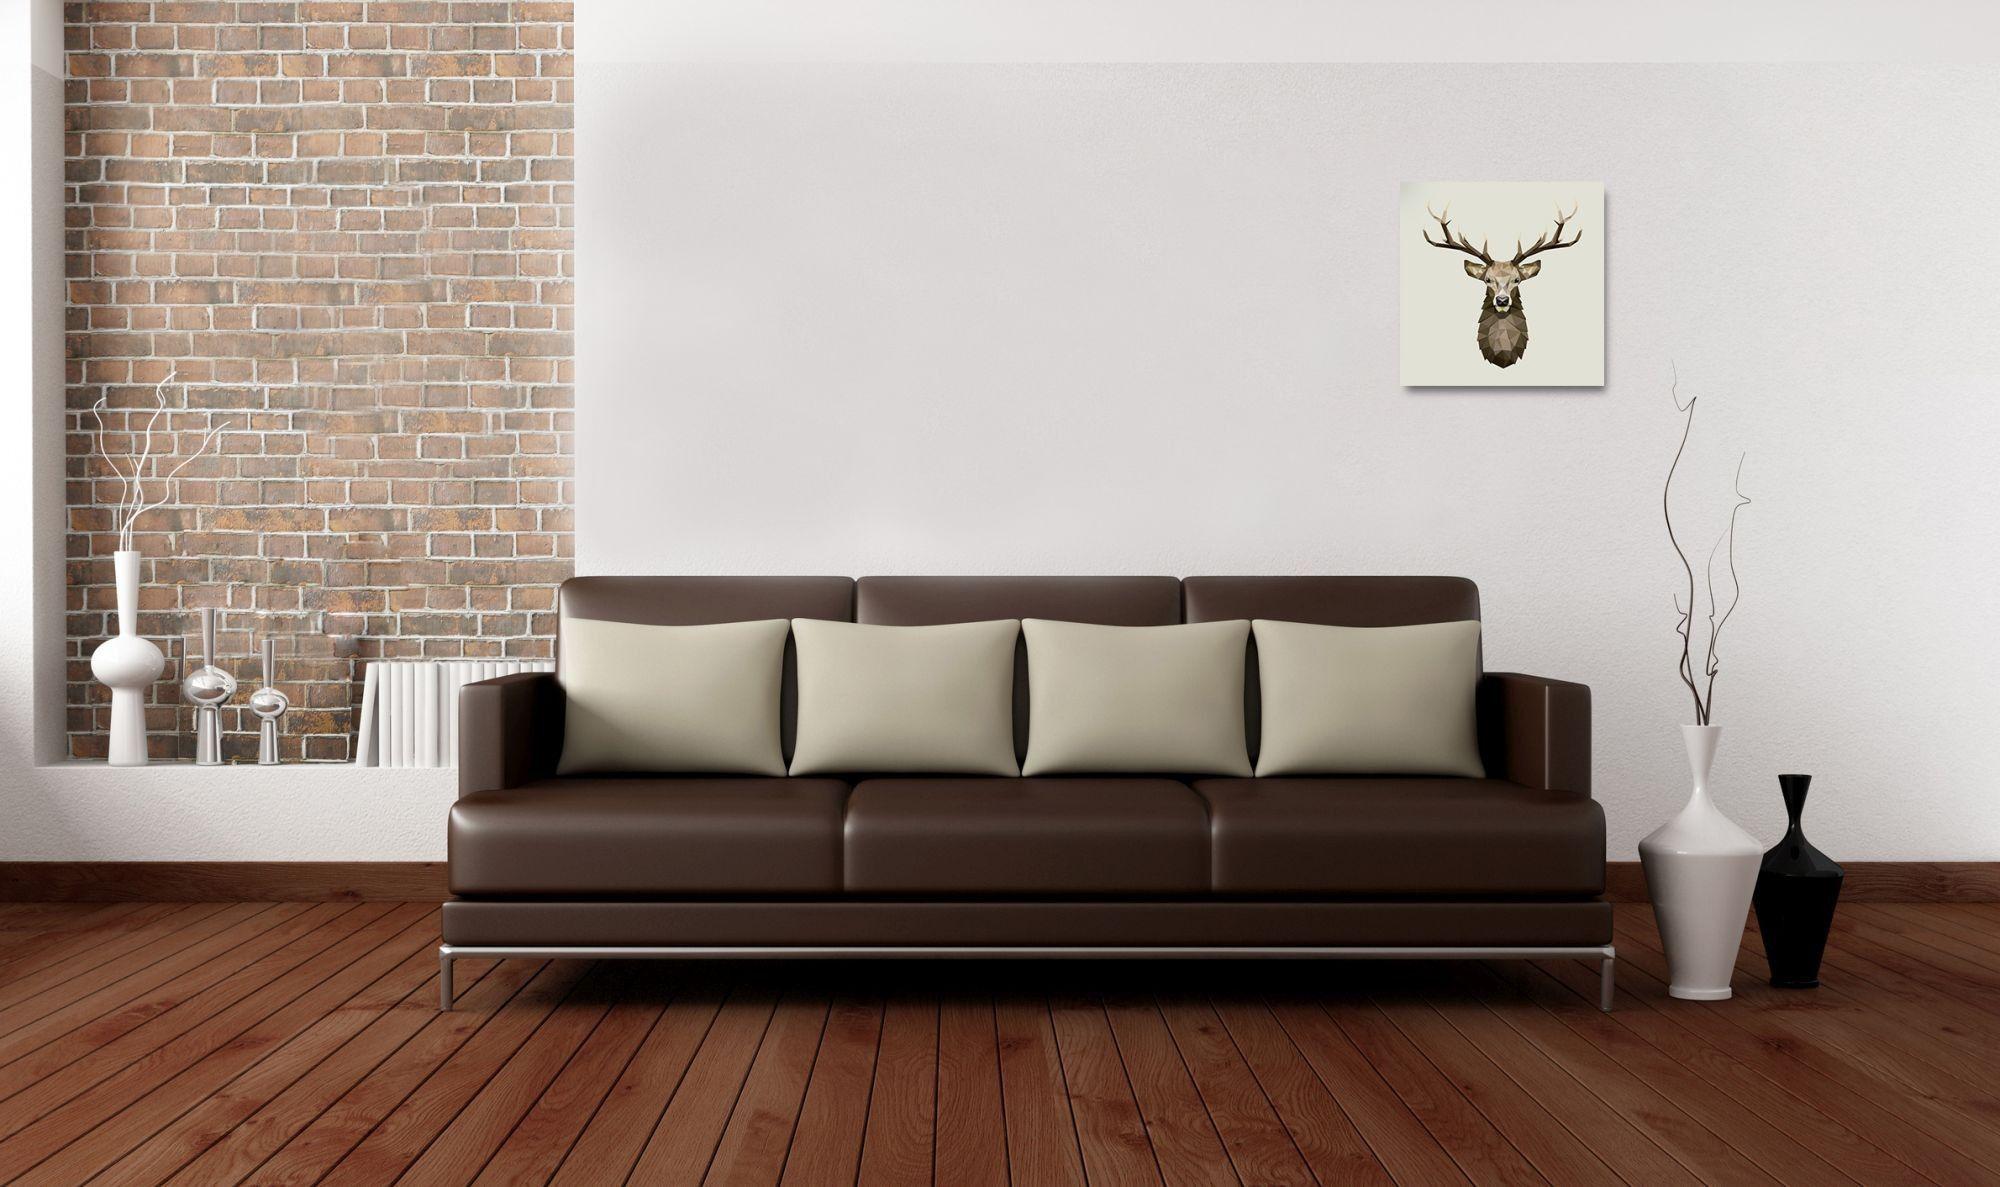 Deko-Panel Motiv: Deer 50x50 cm Spiegelprofi #optiwohnwelt #mancave ...